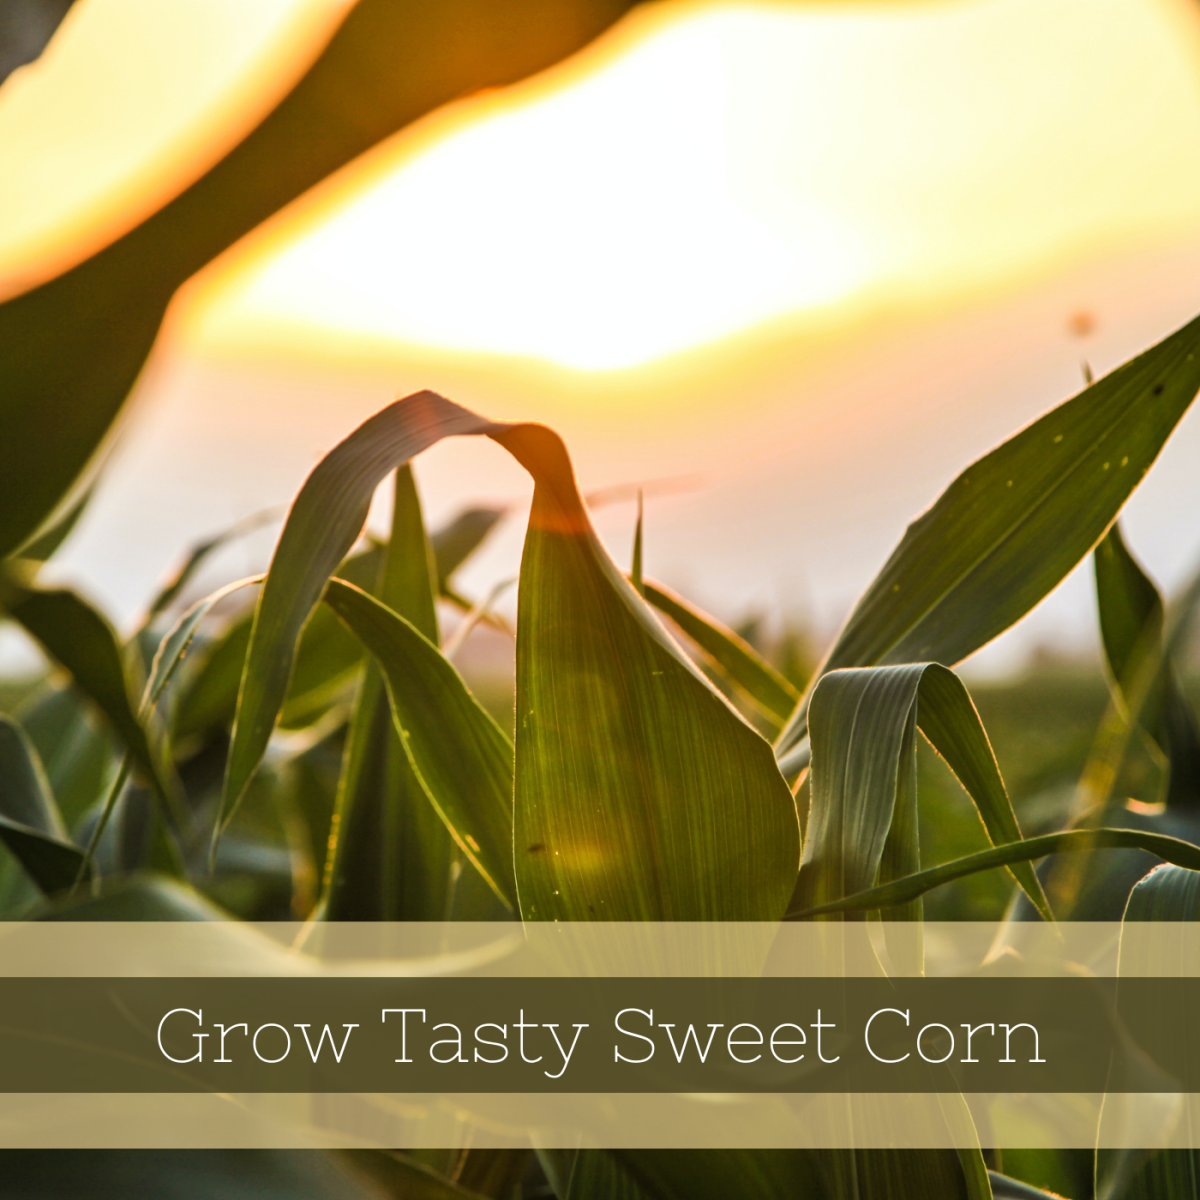 Learn how to grow tasty sweet corn